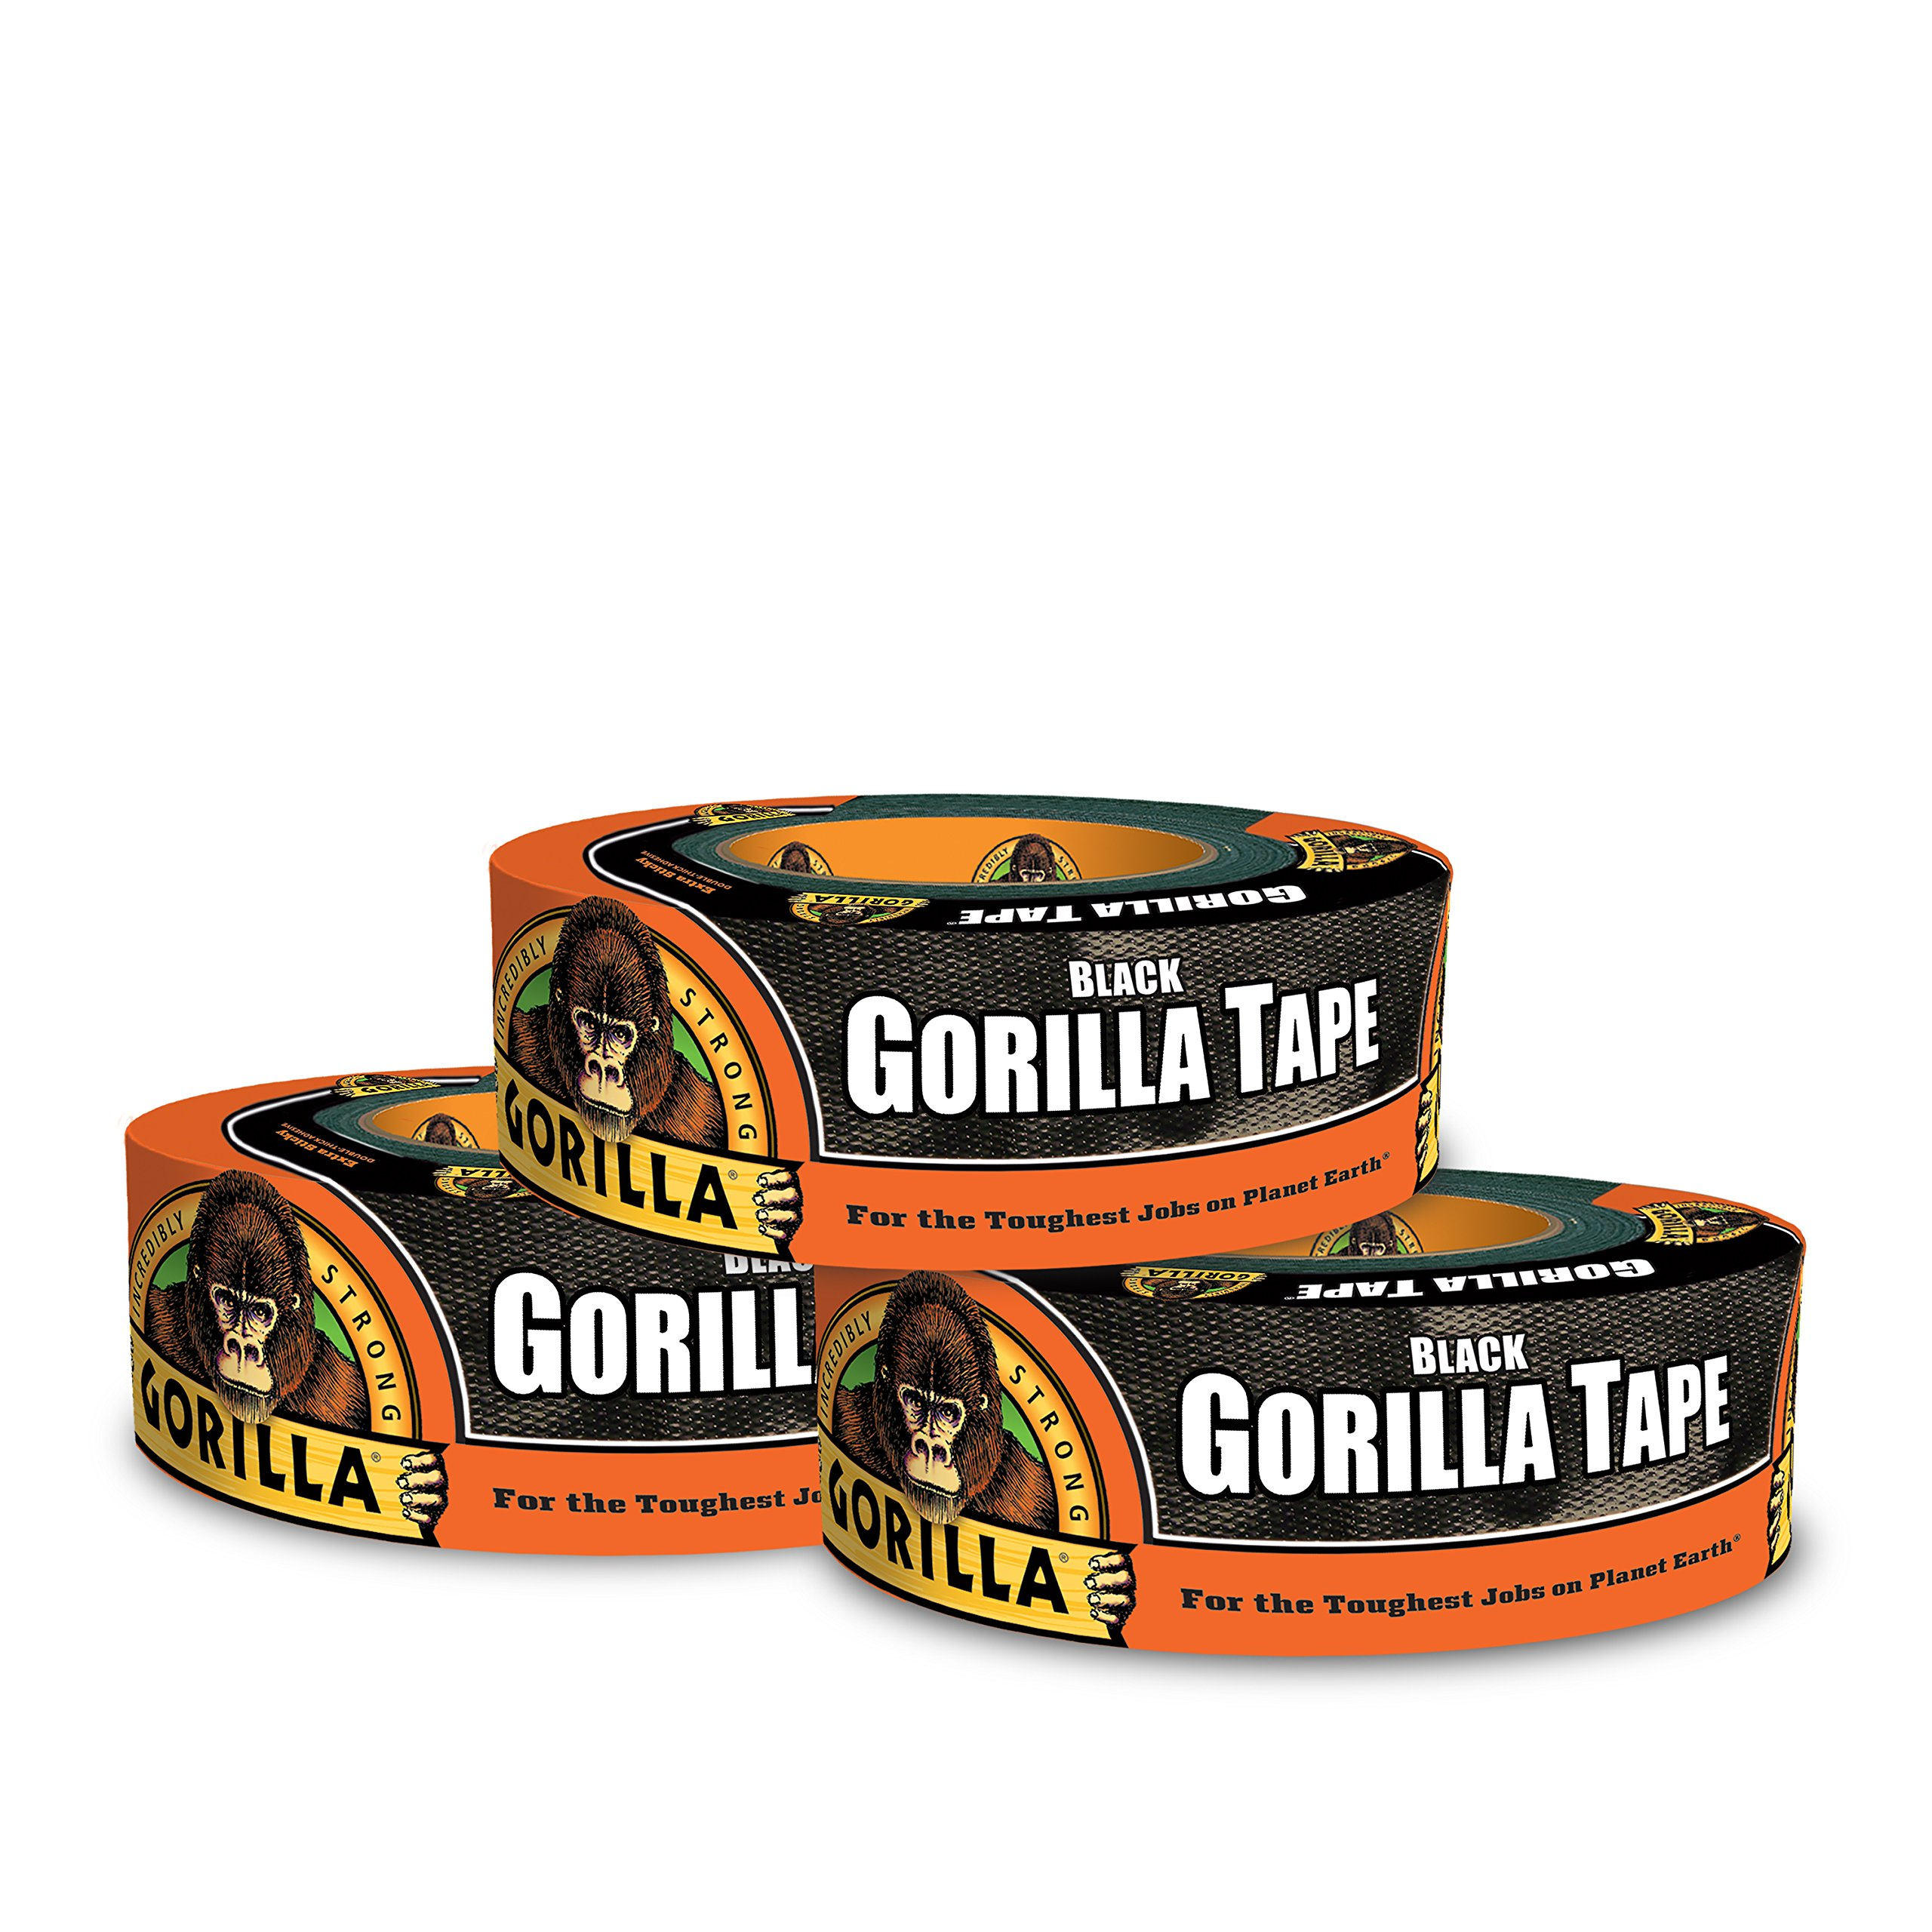 Gorilla Tape, Black Duct Tape, 1.88'' x 35 yd, Black, (Pack of 3)